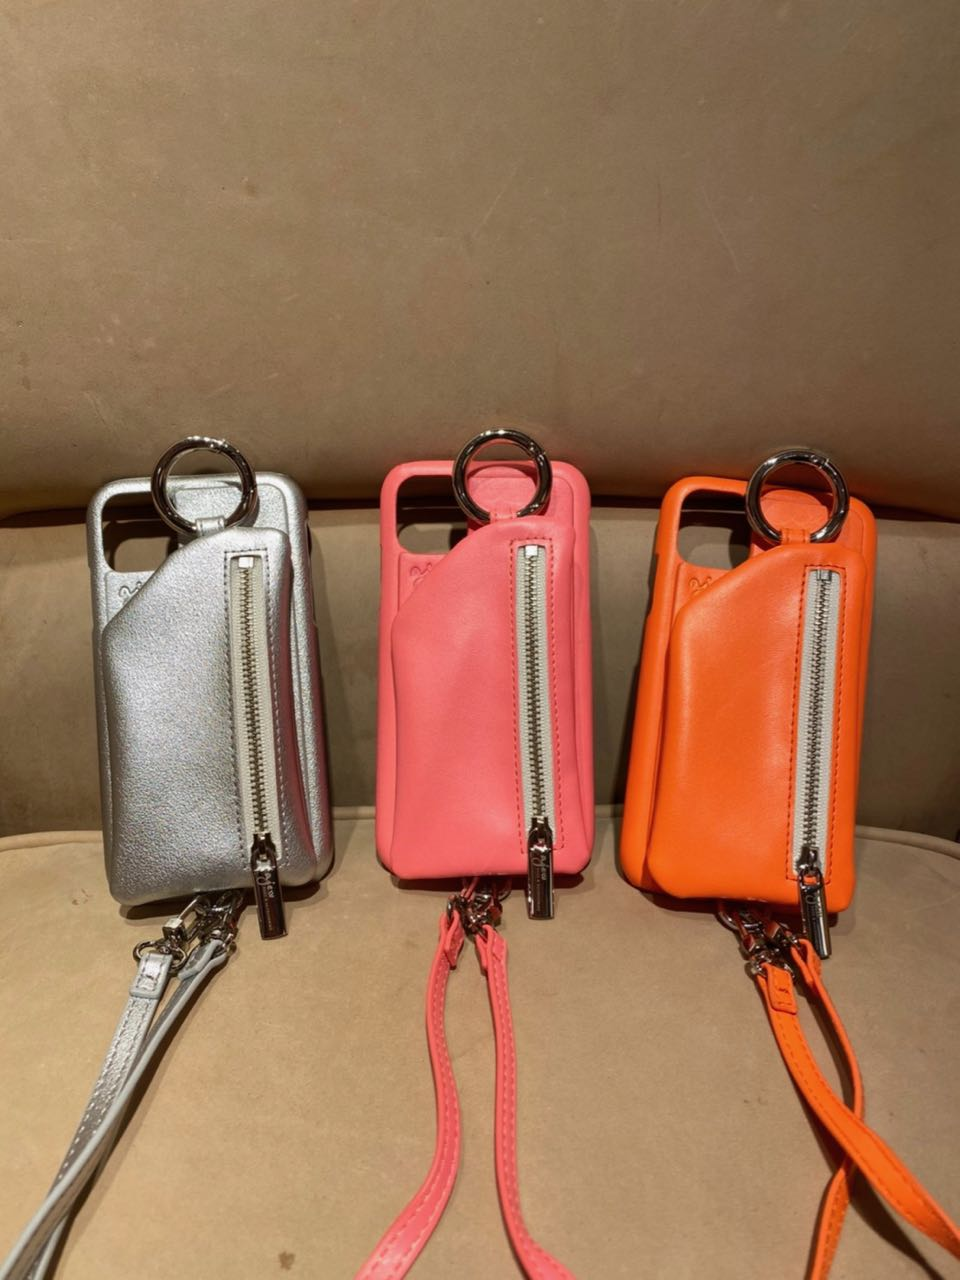 cadenas zipphone neon shoulder